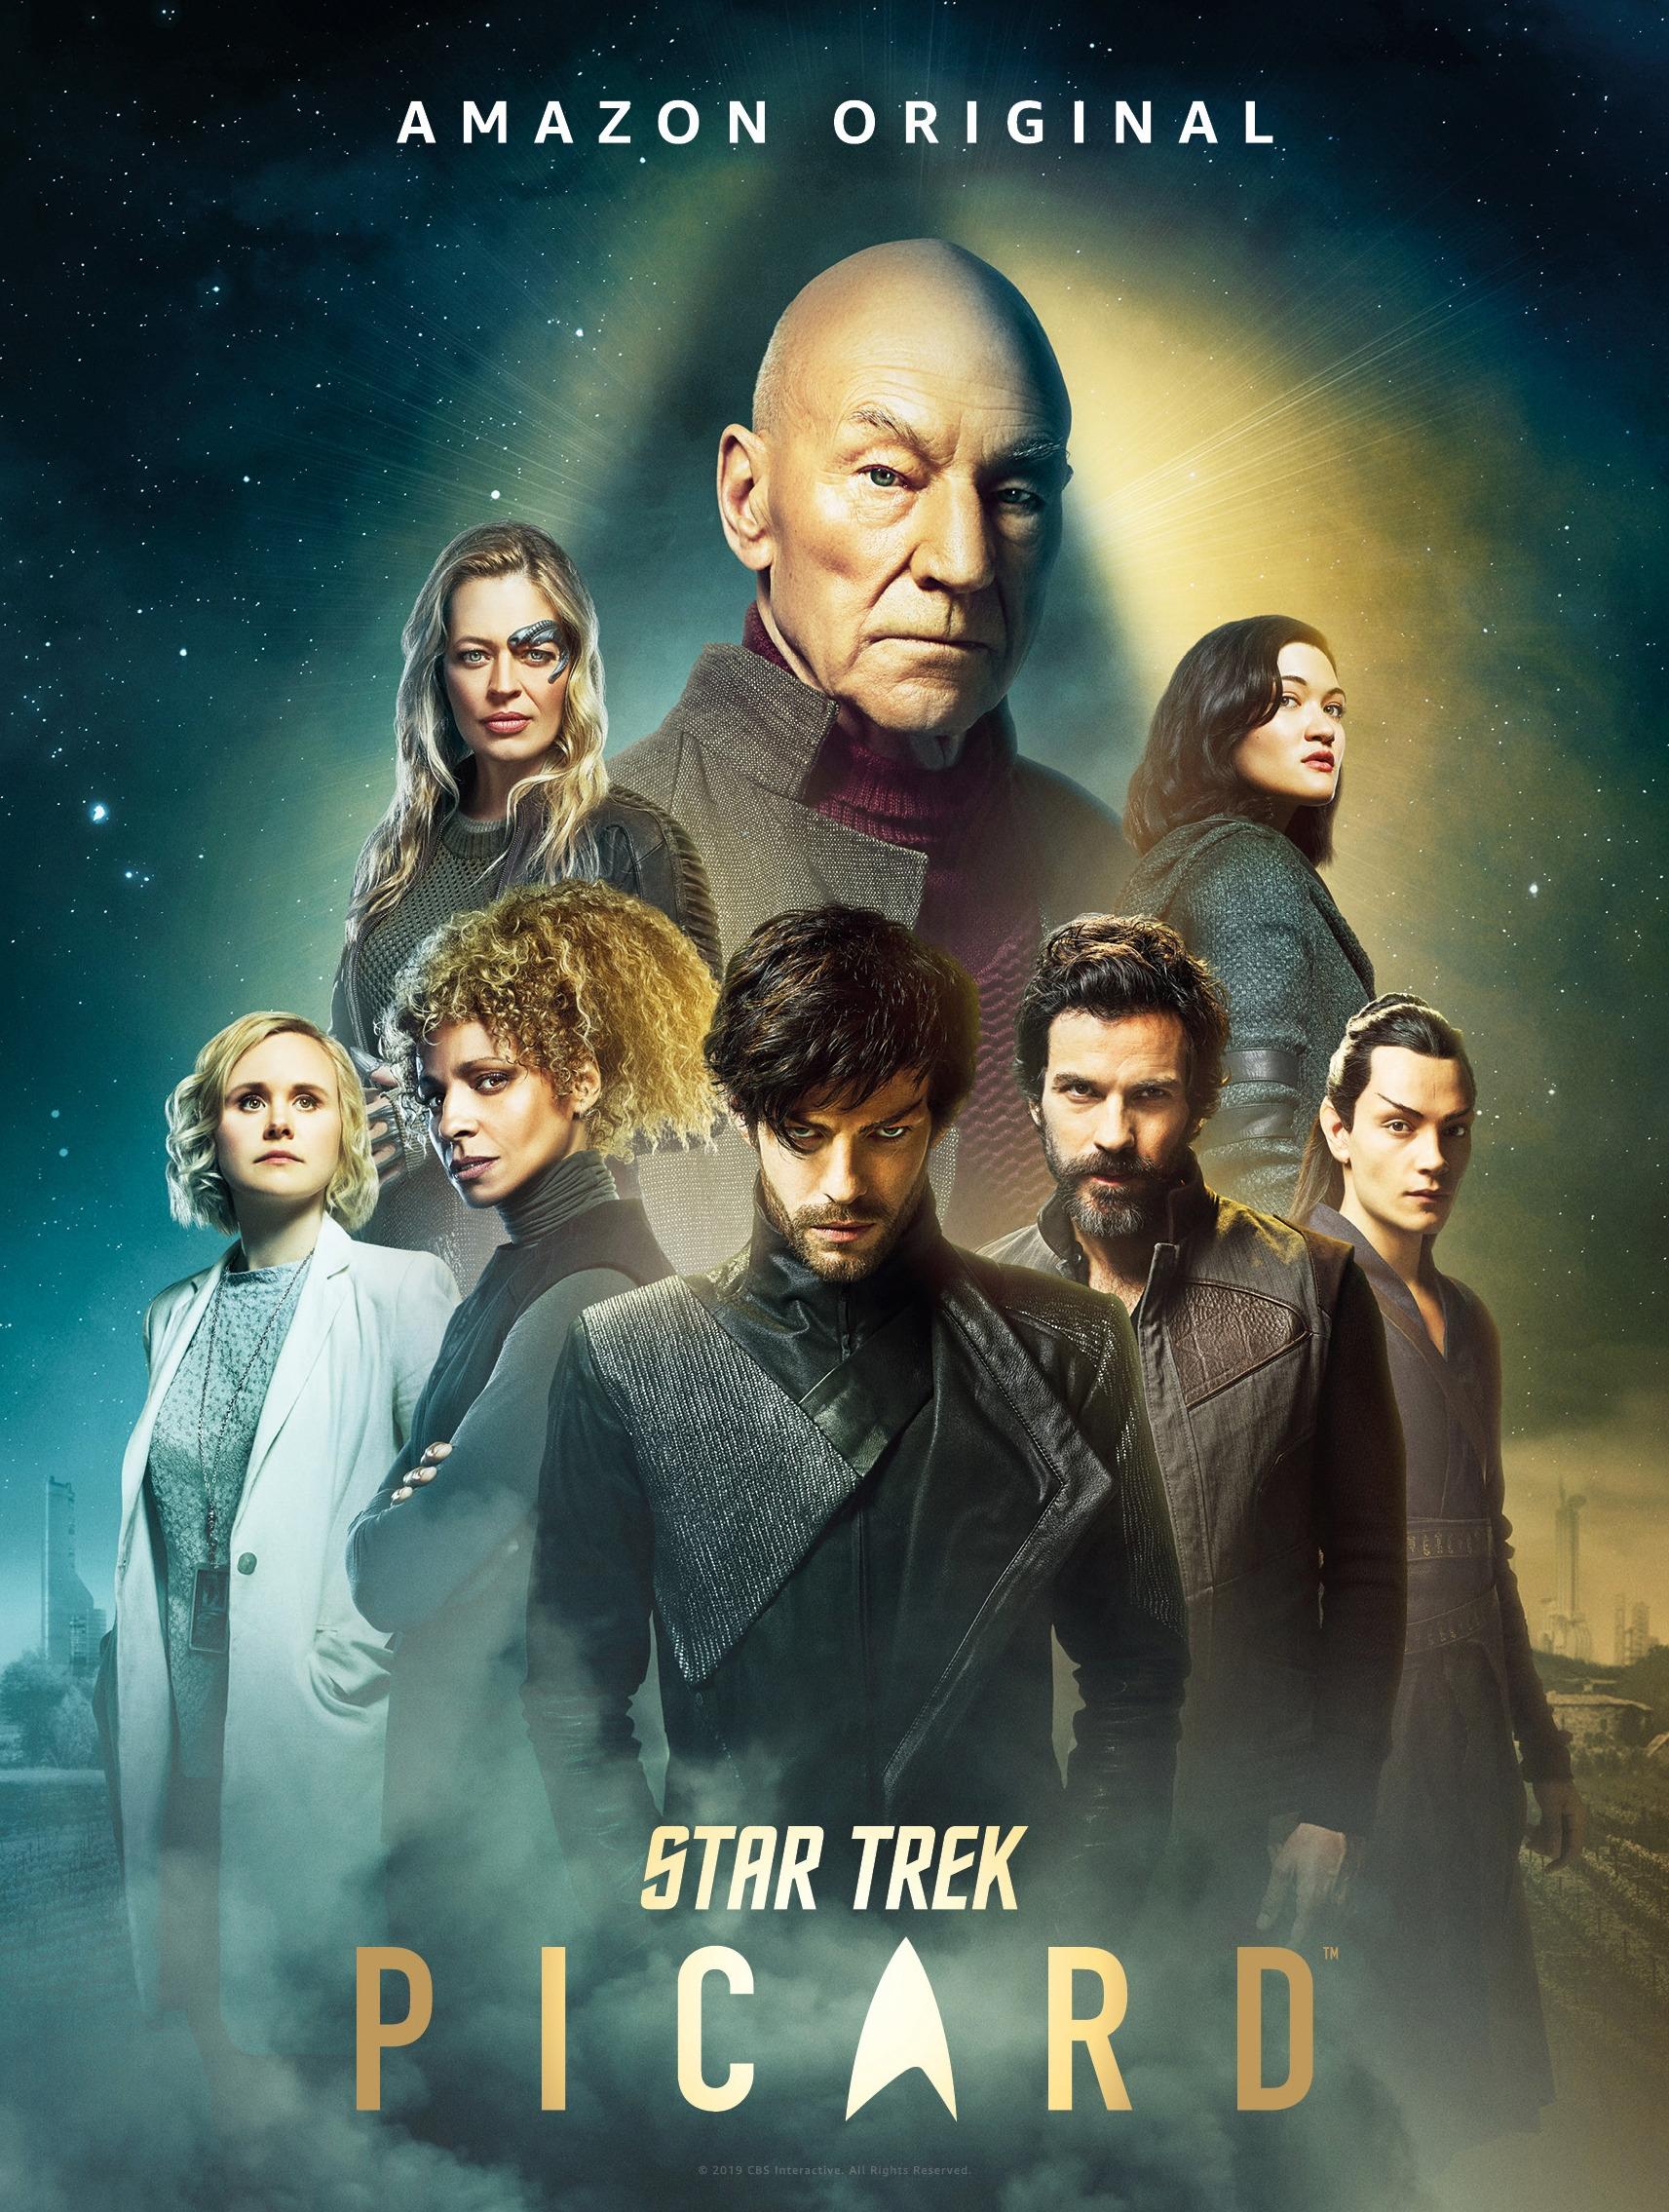 Star Trek Picard Kritik